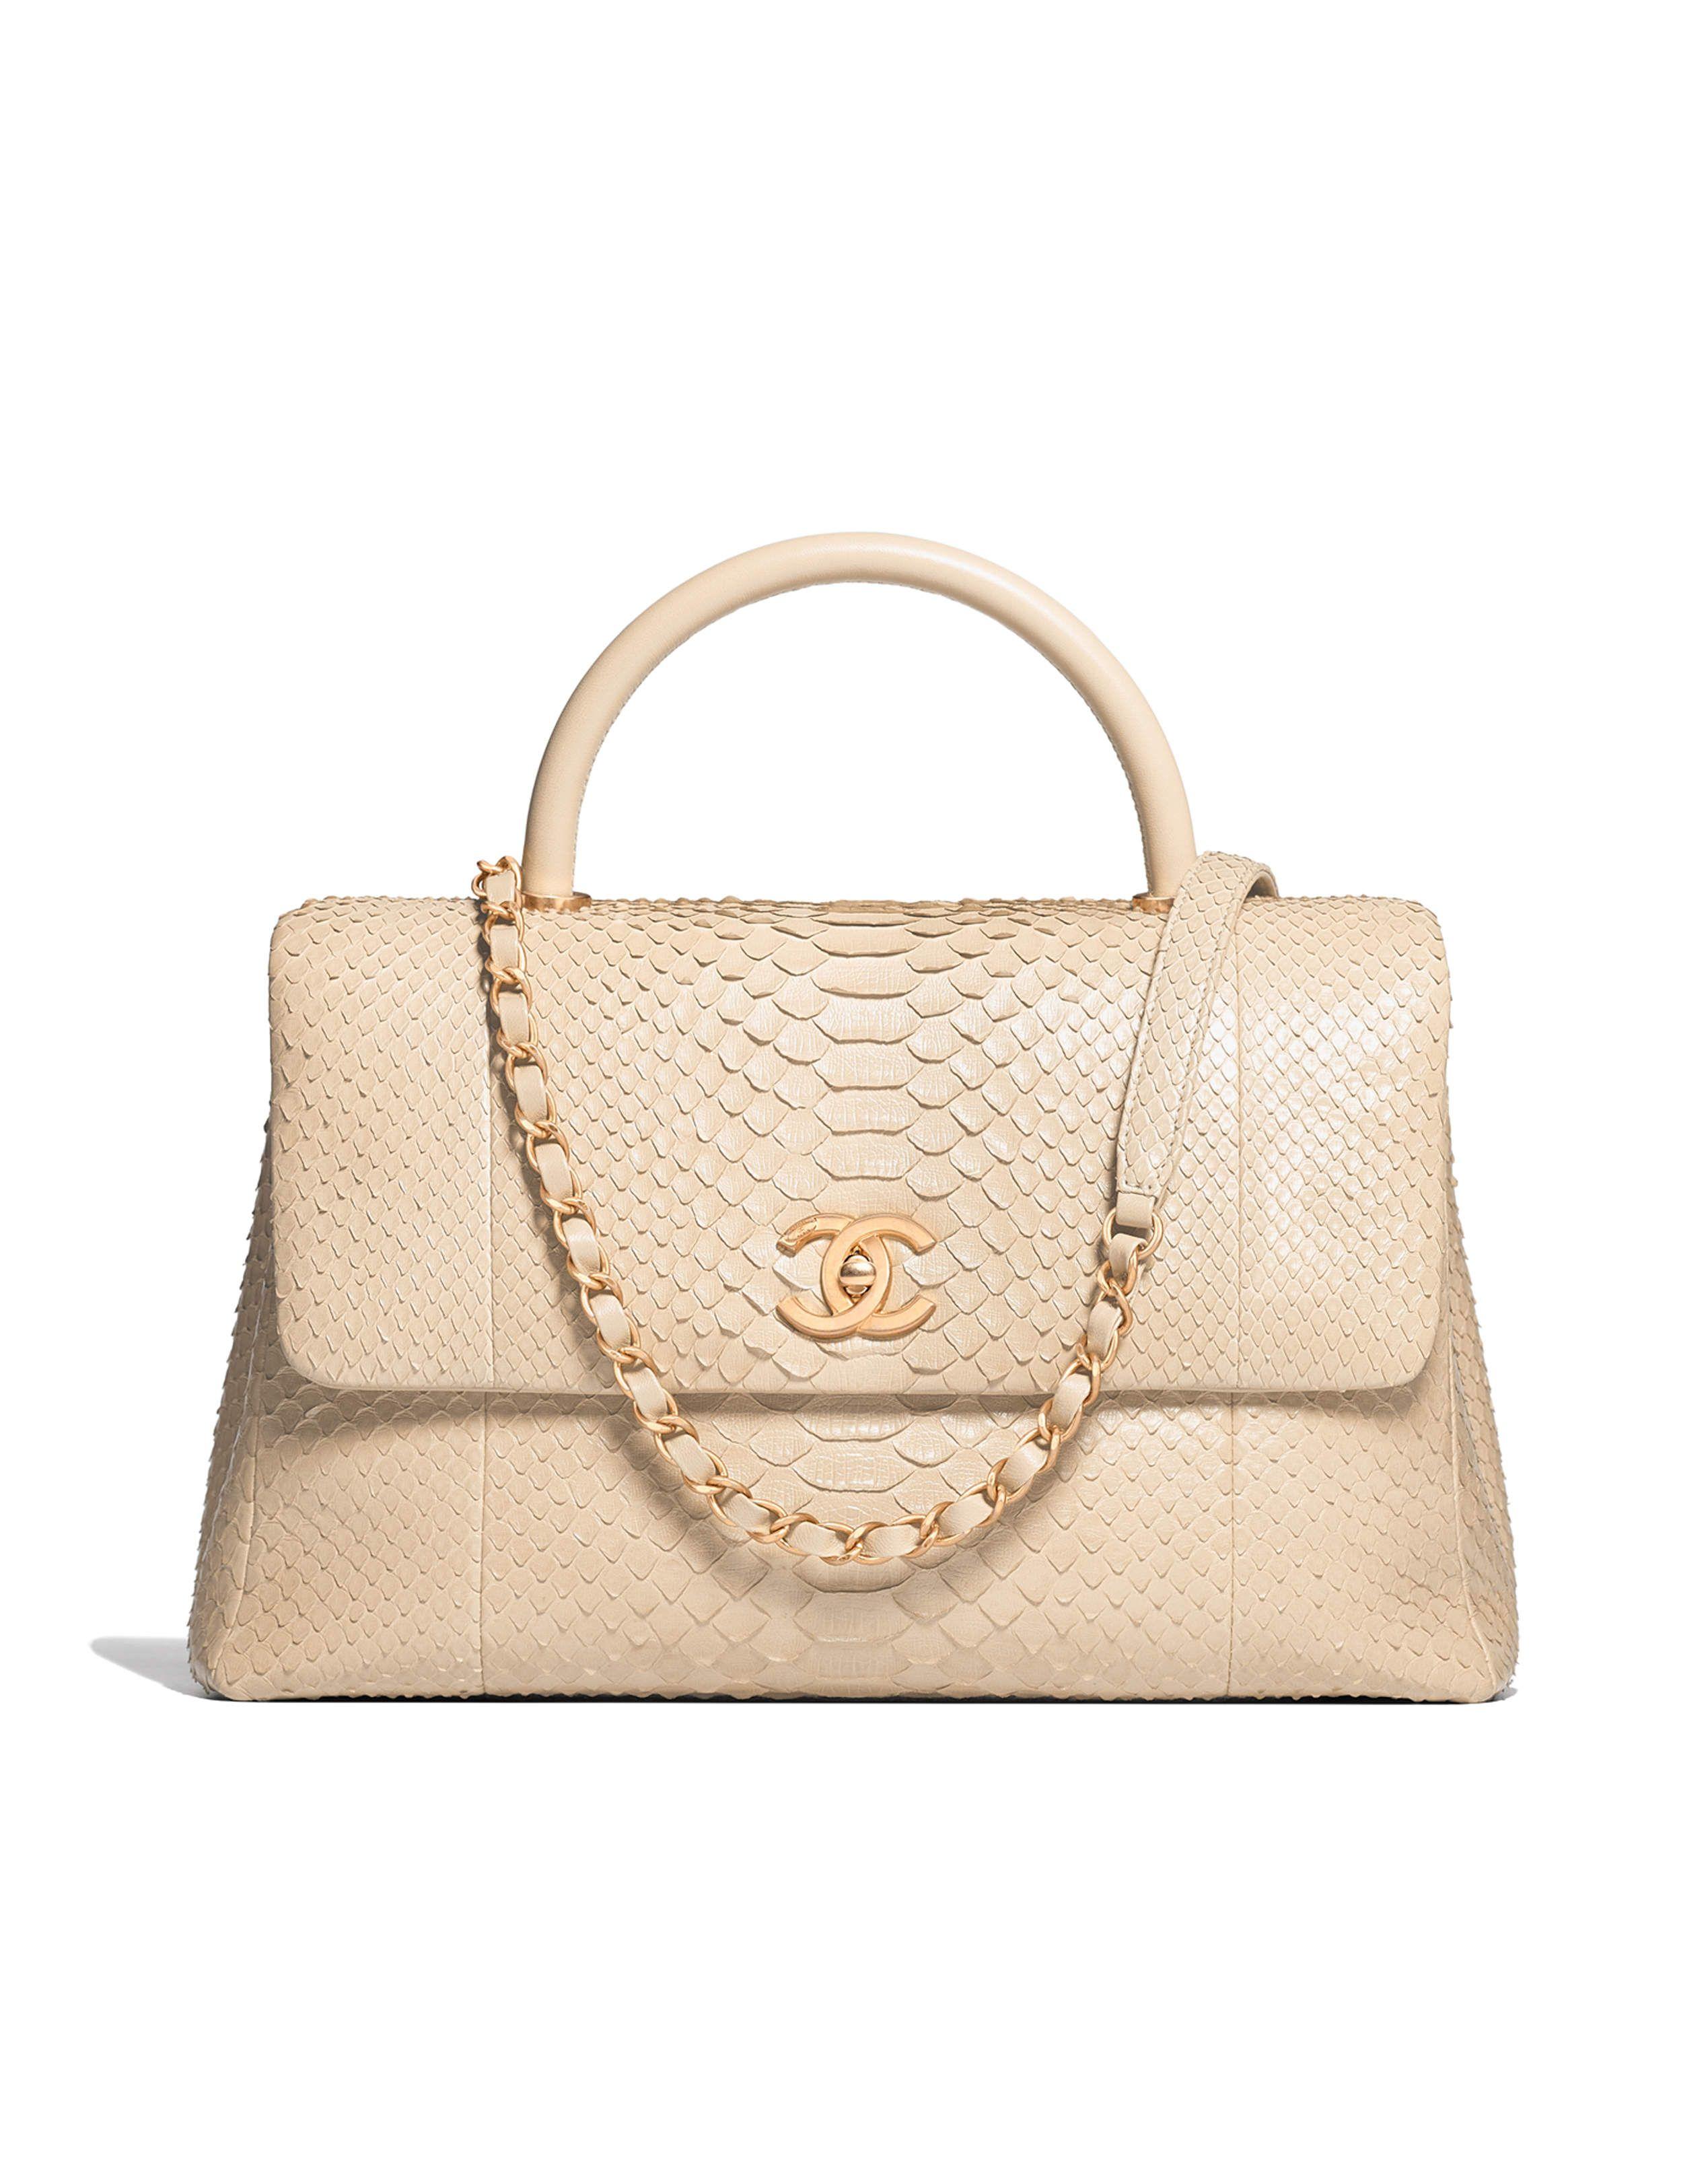 96da98b8974e Large flap bag with top handle, python, lambskin & gold-tone metal-beige -  CHANEL